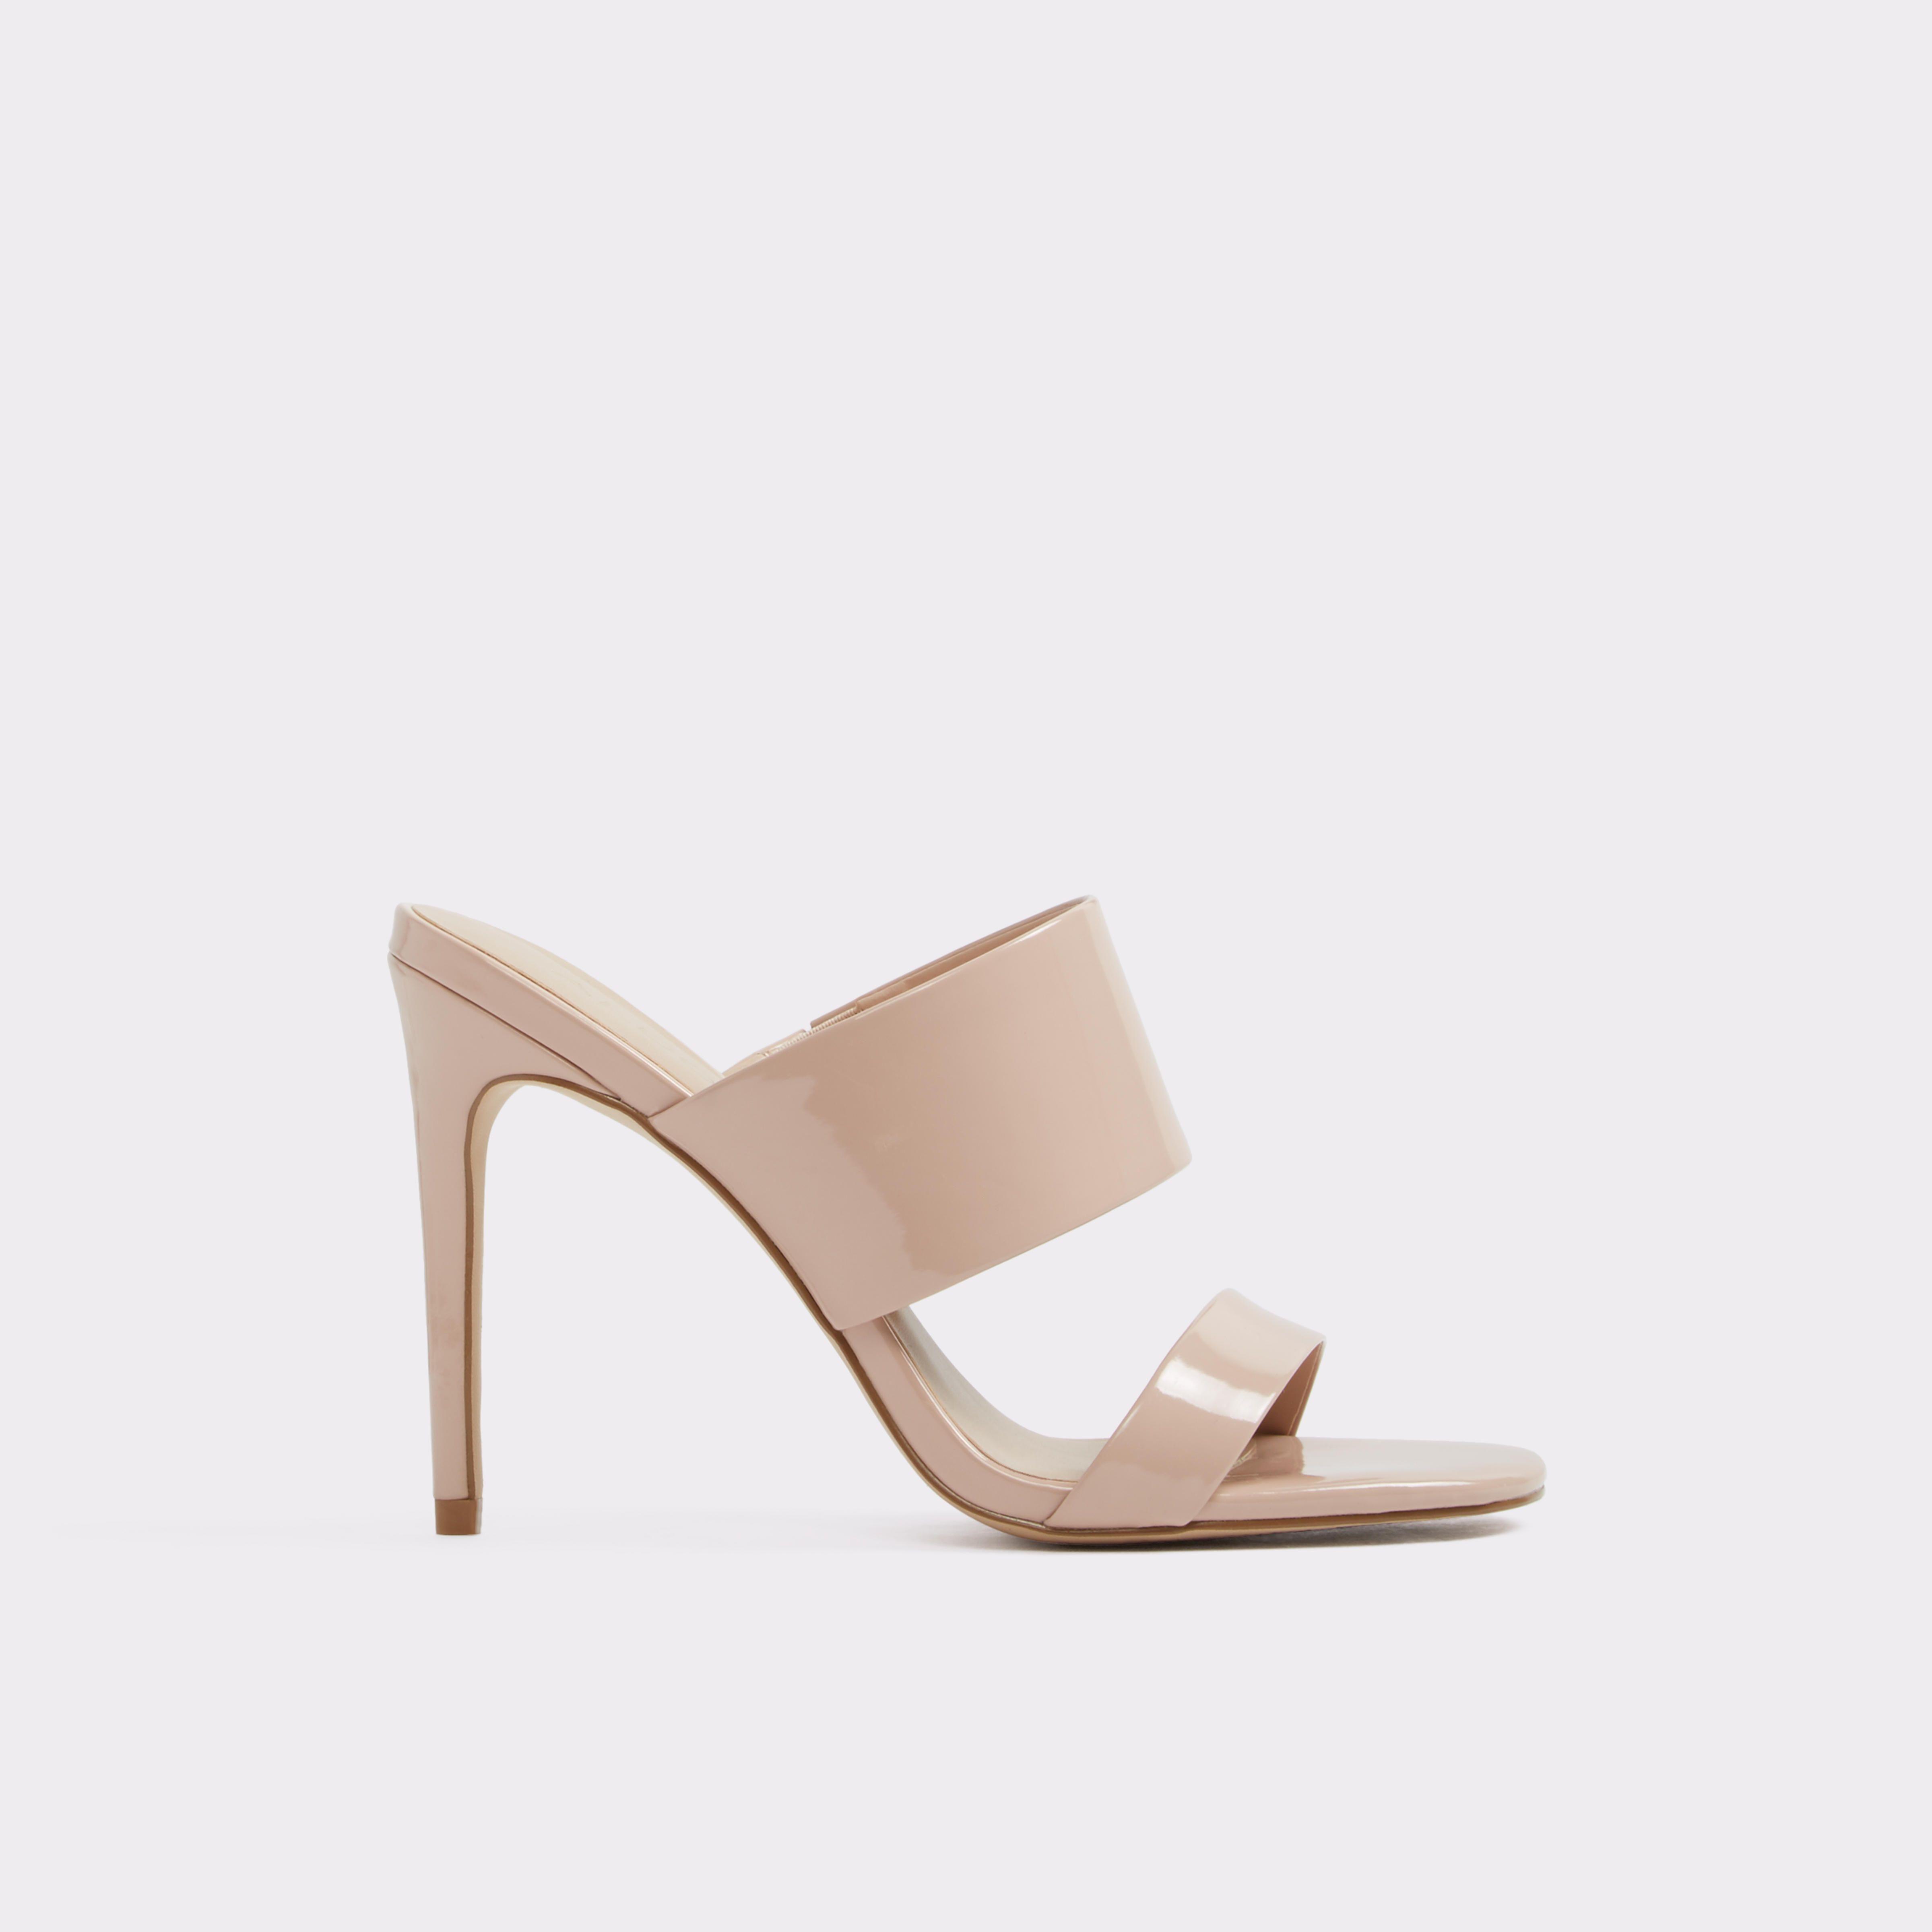 5ca9755d471 Froema Bone Women s Open-toe heels